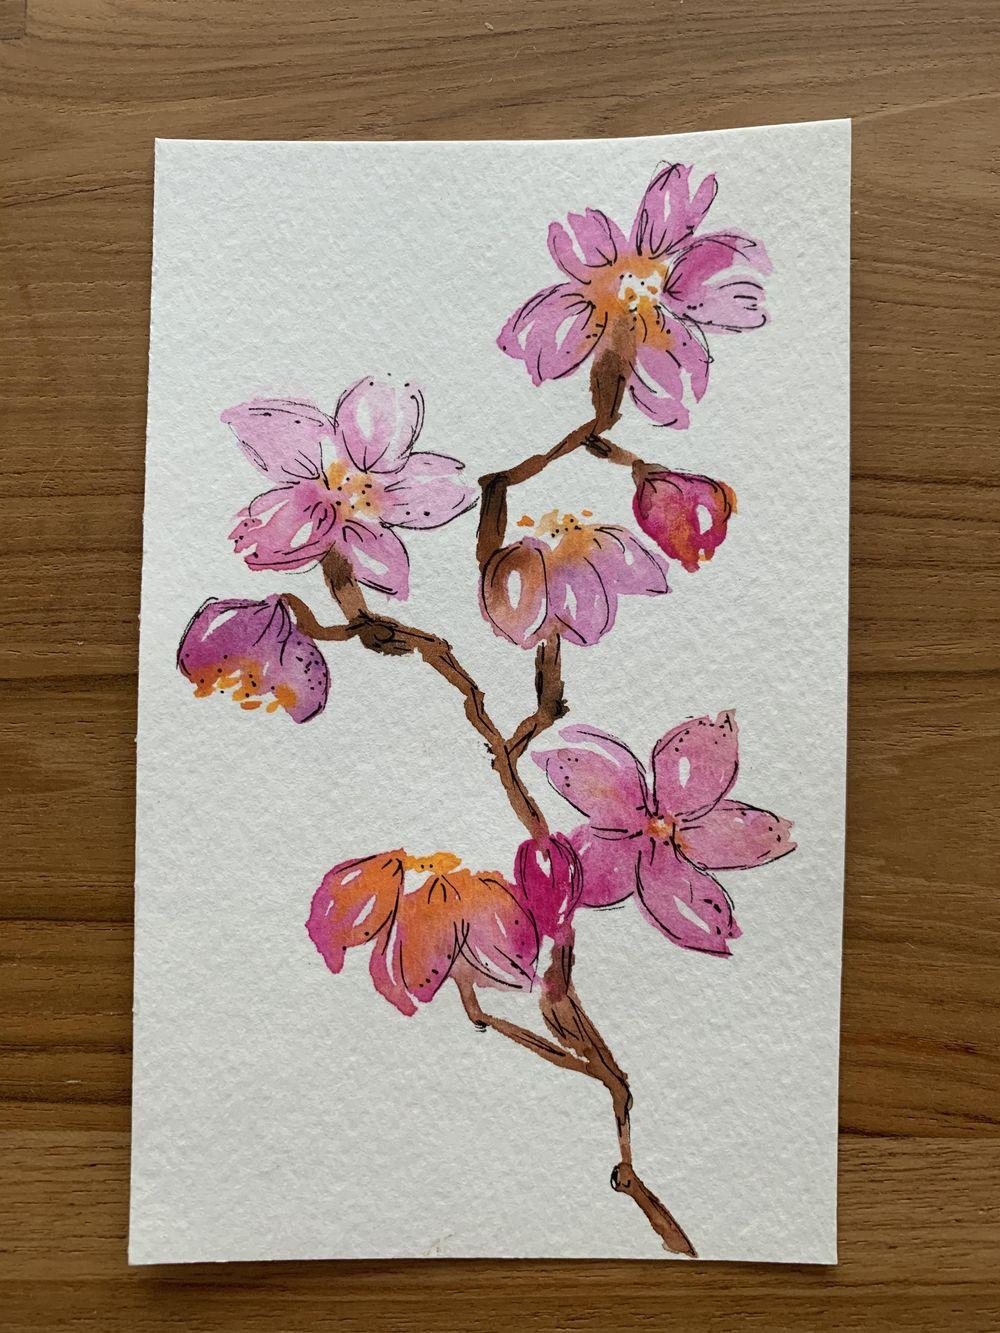 Luminous Watercolor Florals - image 1 - student project